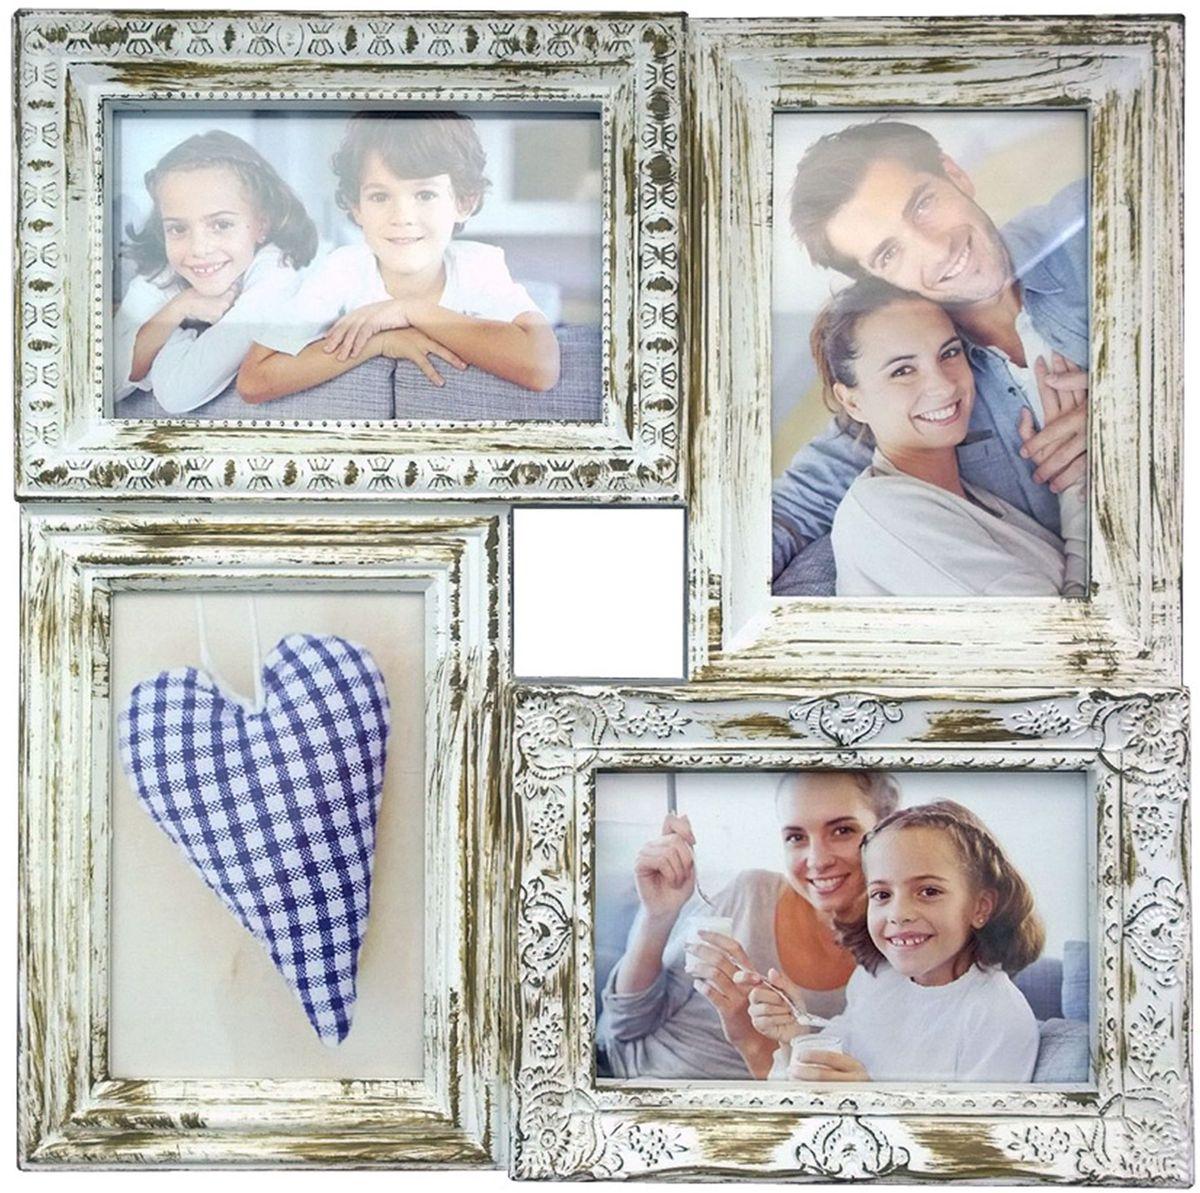 Коллаж Platinum, цвет: античный белый, 4 фоторамки. BIN-112181PLATINUM BH-1315-White-БелыйПластиковый коллаж с 4 фото 10х15.